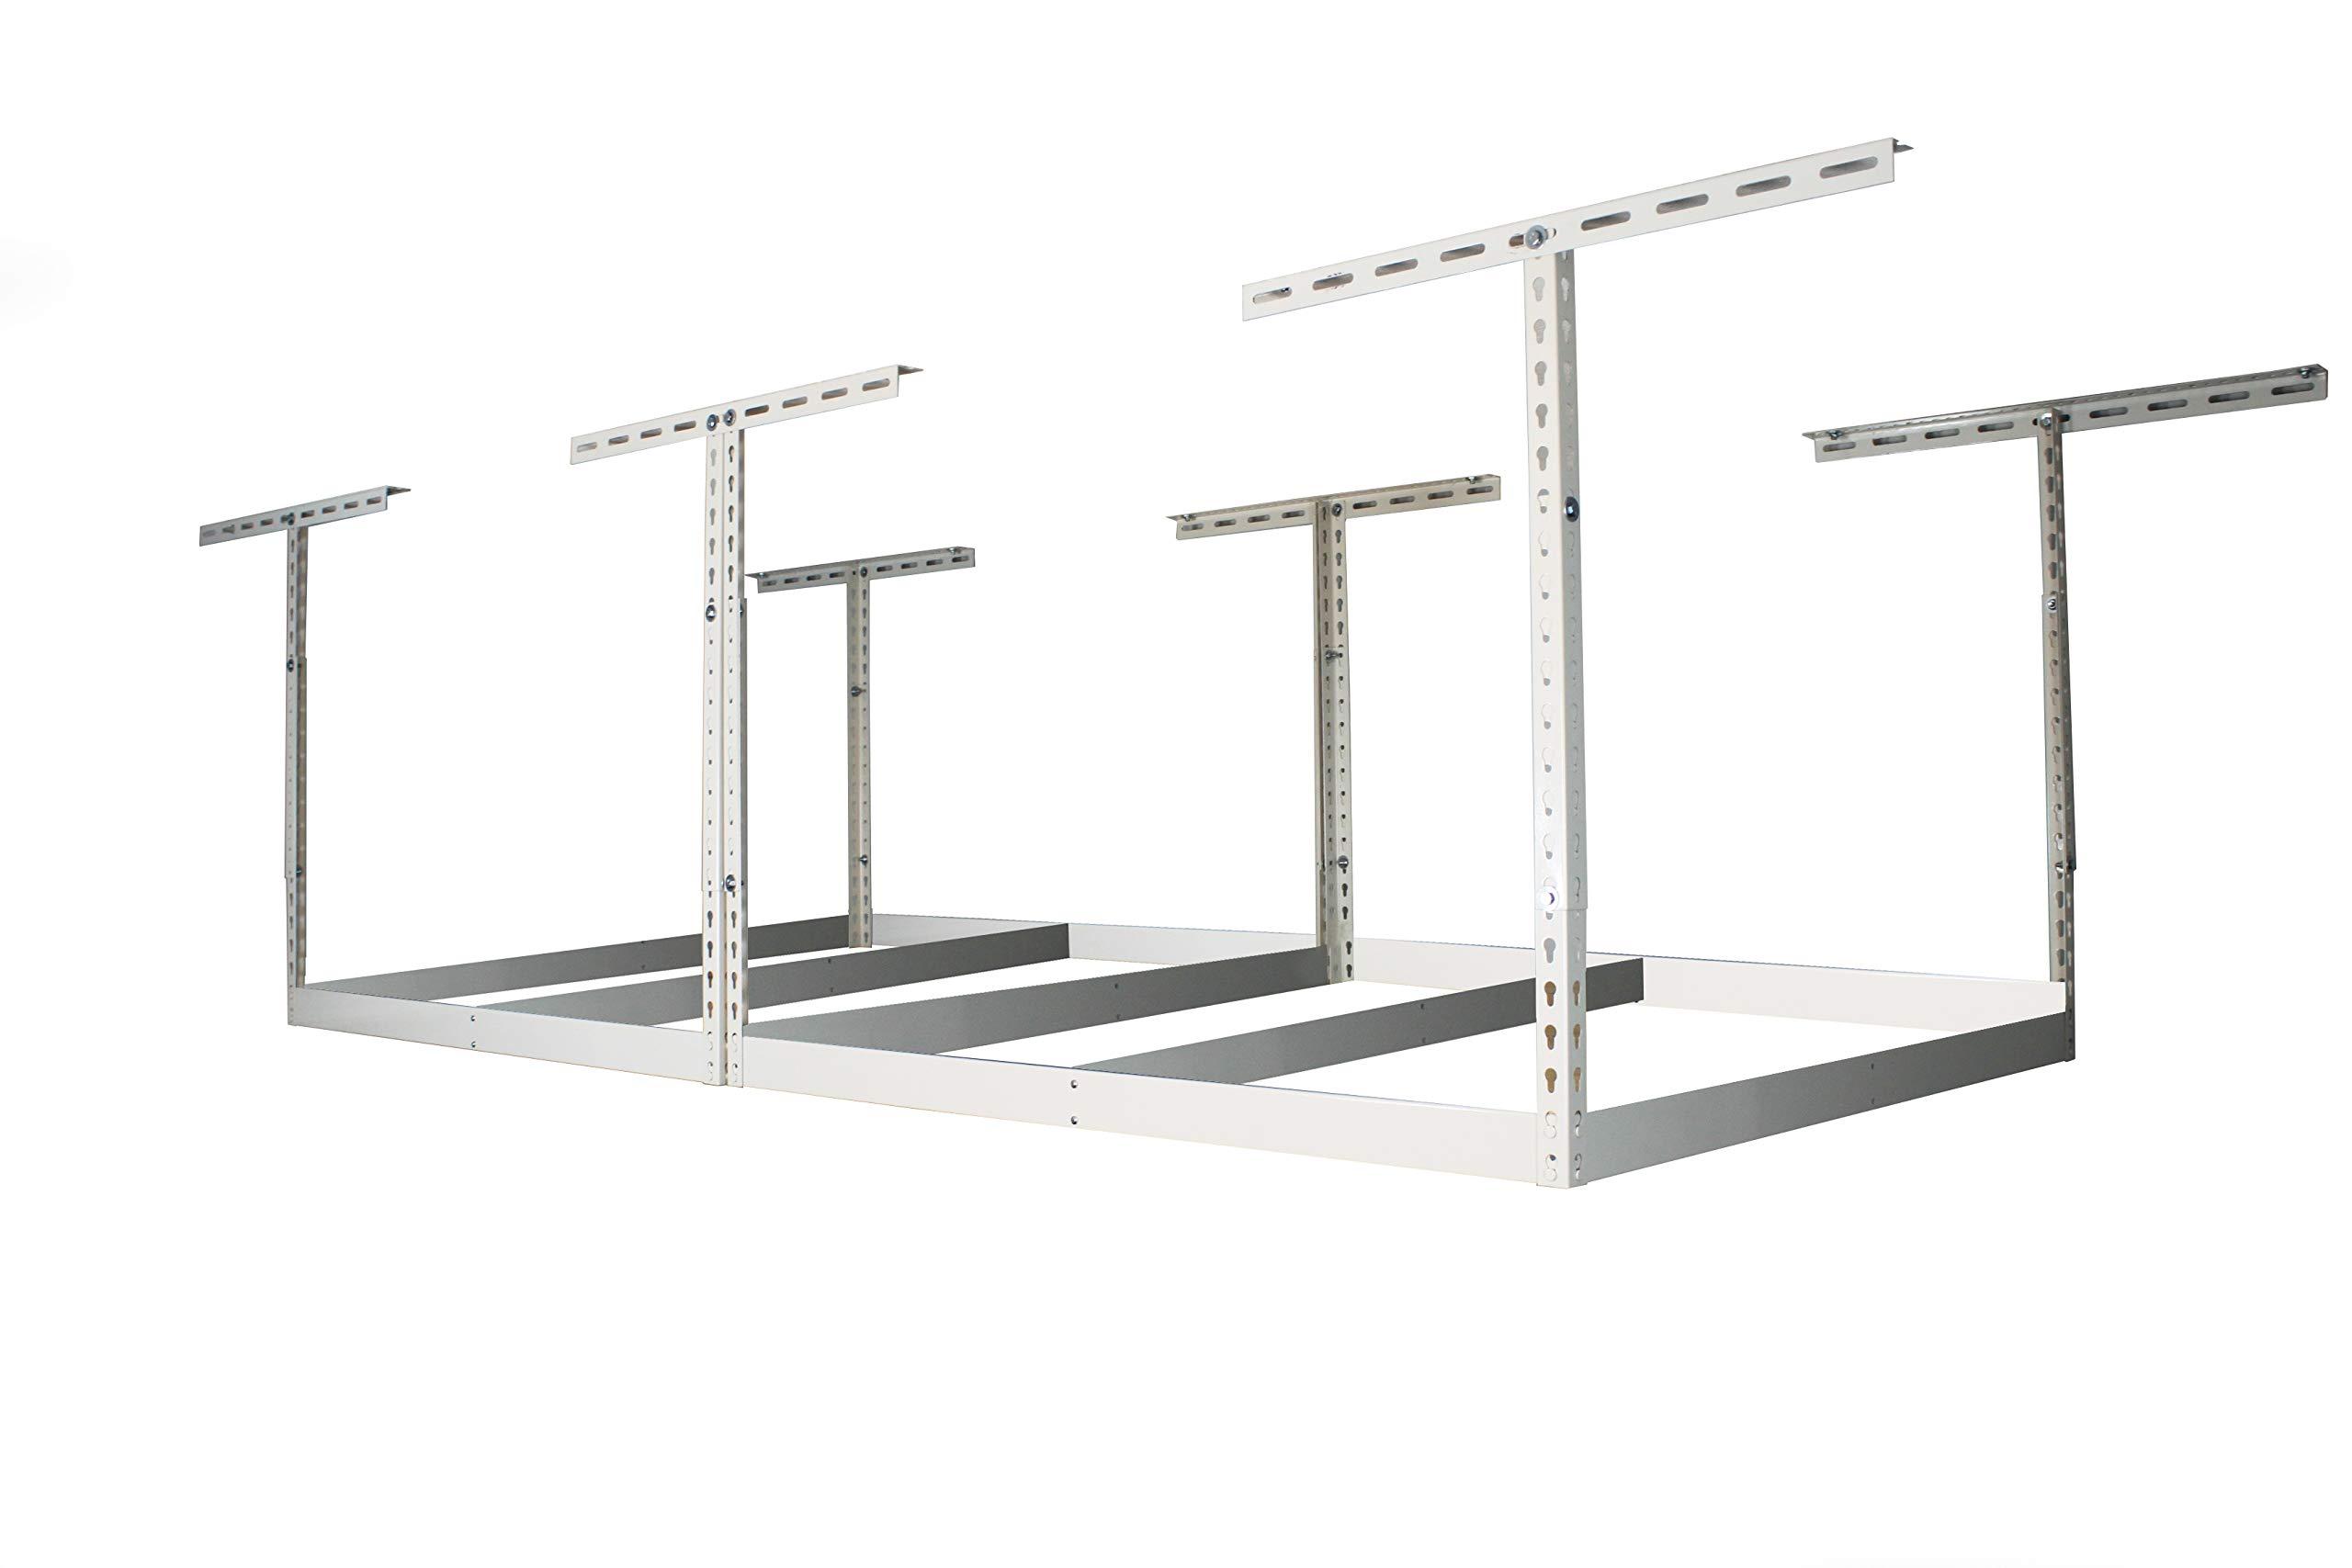 MonsterRax 4x8 Garage Storage Rack - Height Adjustable Steel Overhead Storage Rack Frame Kit with Adjustable Height - 600 Pound Weight Capacity (White, 24''-45'' Drop) by MonsterRax